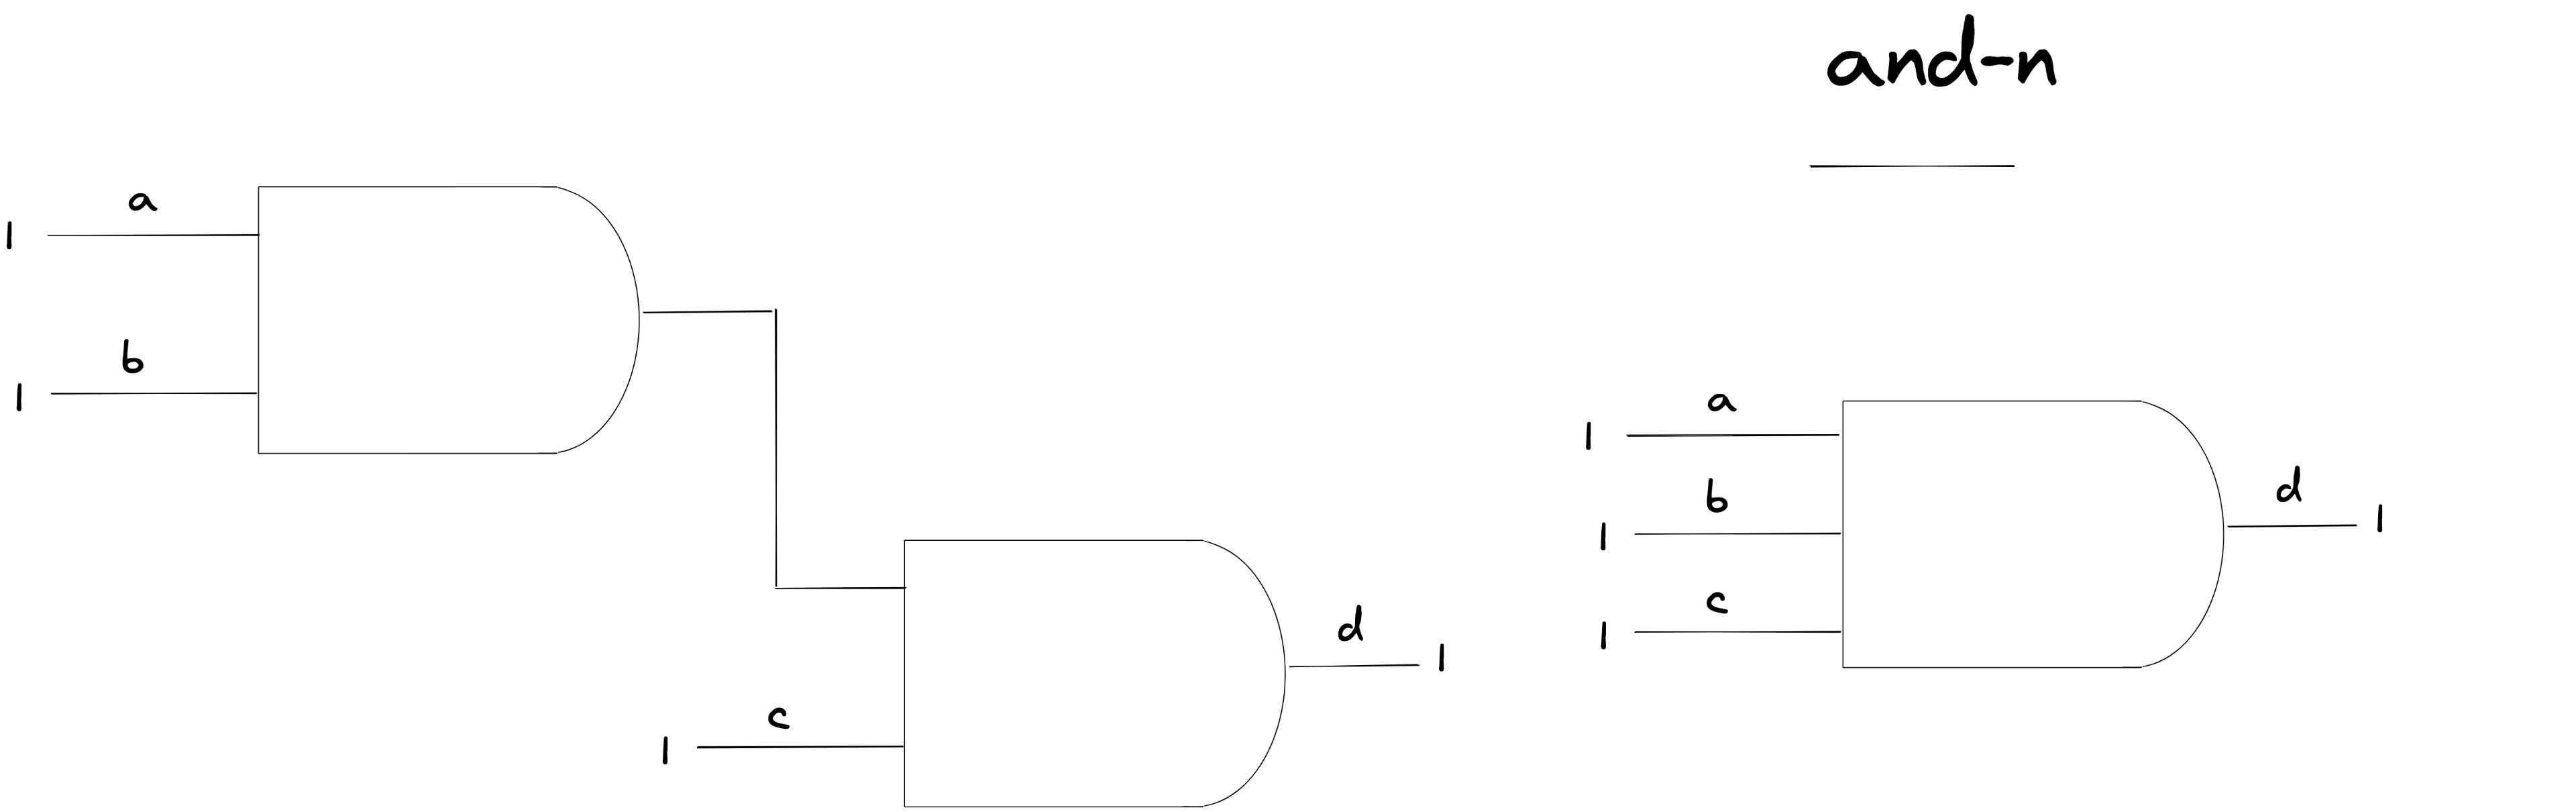 umair-akbar-aHR0cHM6Ly91c2VyLWltYWdlcy5naXRodWJ1c2VyY29udGVudC5jb20vOTg0NTc0Lzk1Nzc2OTQ4LTQ0ZGQxZjAwLTBjOTMtMTFlYi05NWM4LWQwNWRhYjk1ZjI0MC5wbmc - Simulating RAM in Clojure